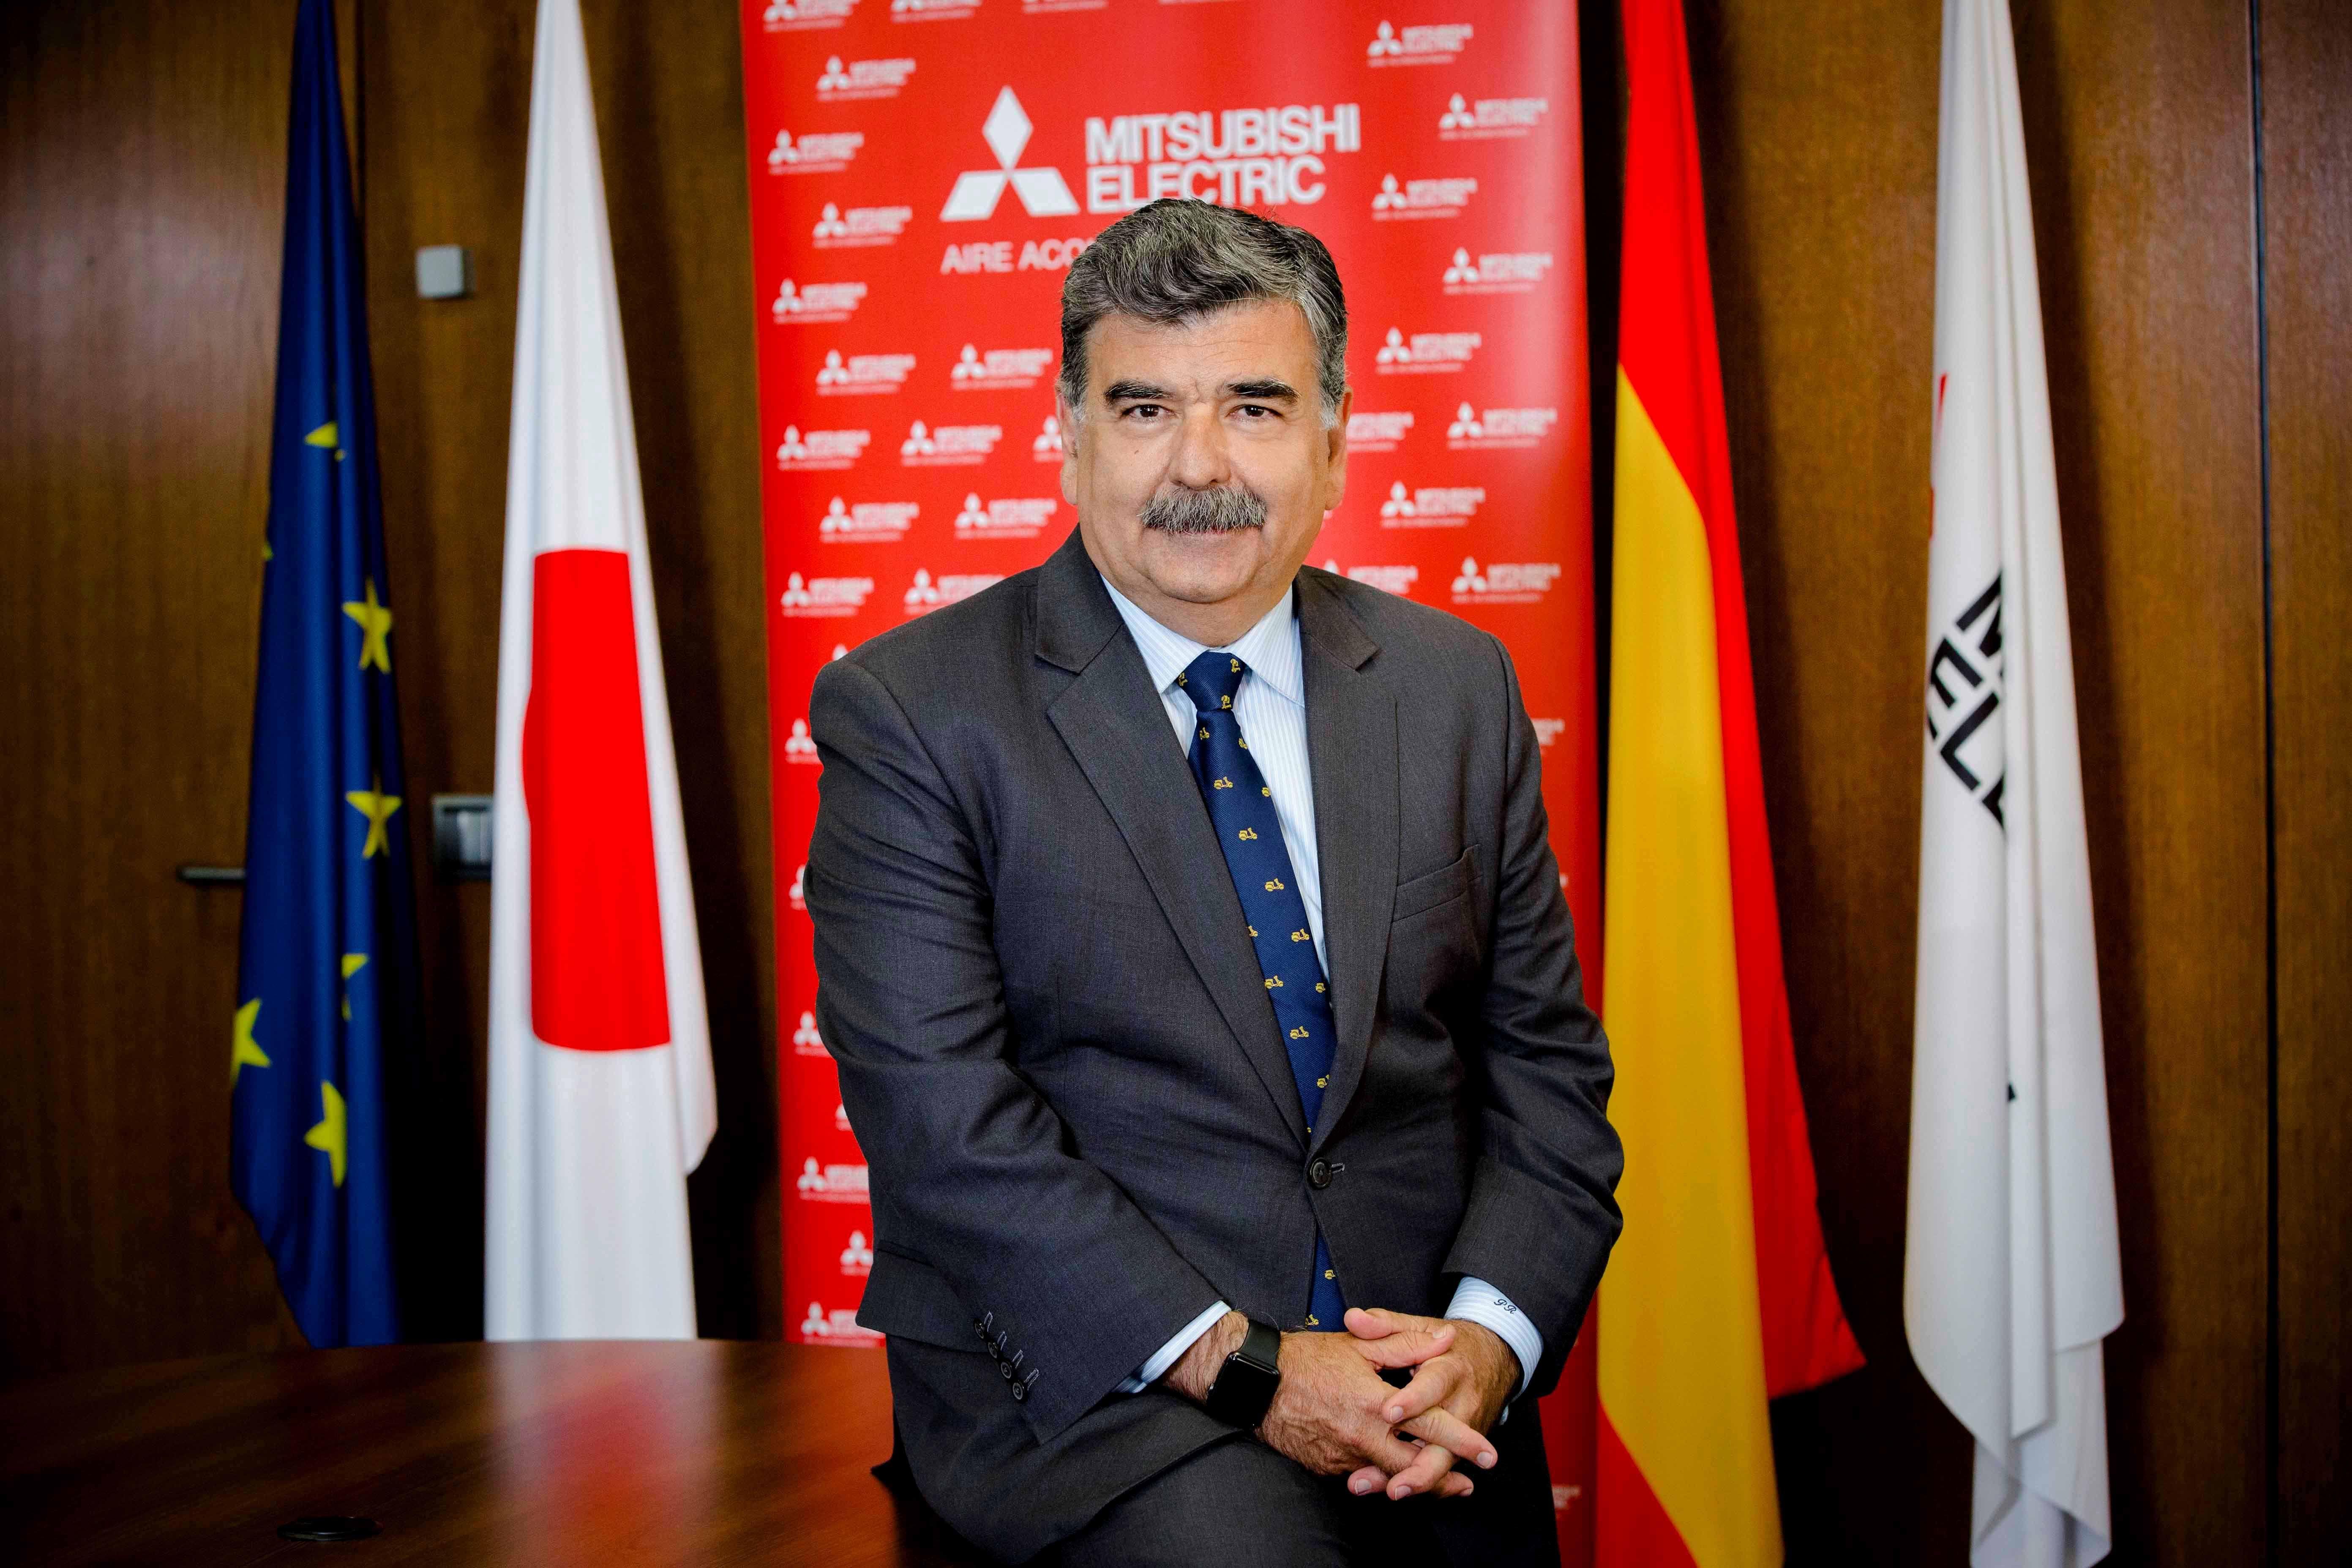 Foto de Pedro Ruiz, Presidente de Mitsubishi Electric Europe, B.V.,